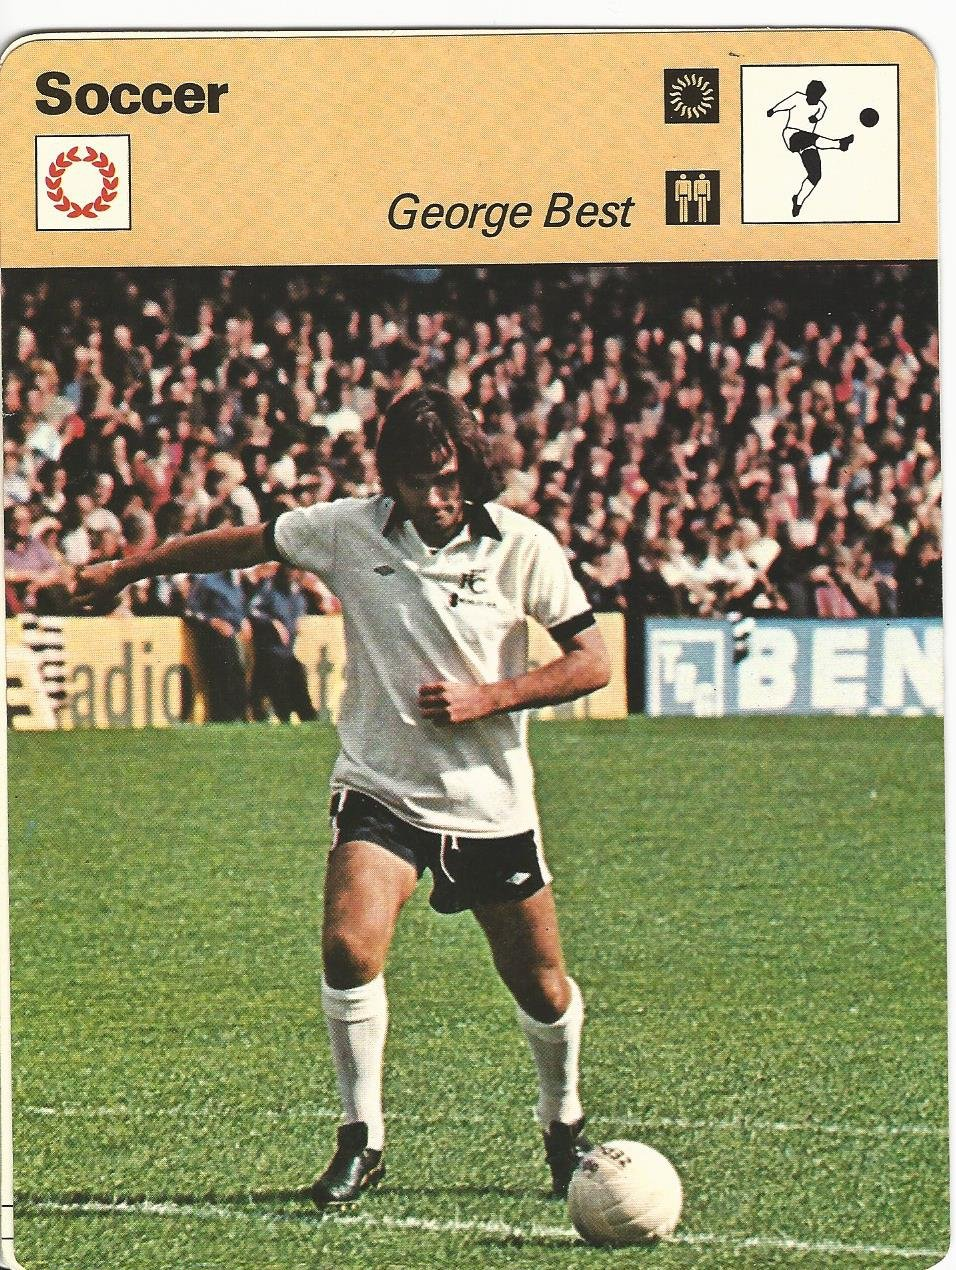 1977-79 Sportscaster Card, 34.22 Soccer, George Best, Ireland